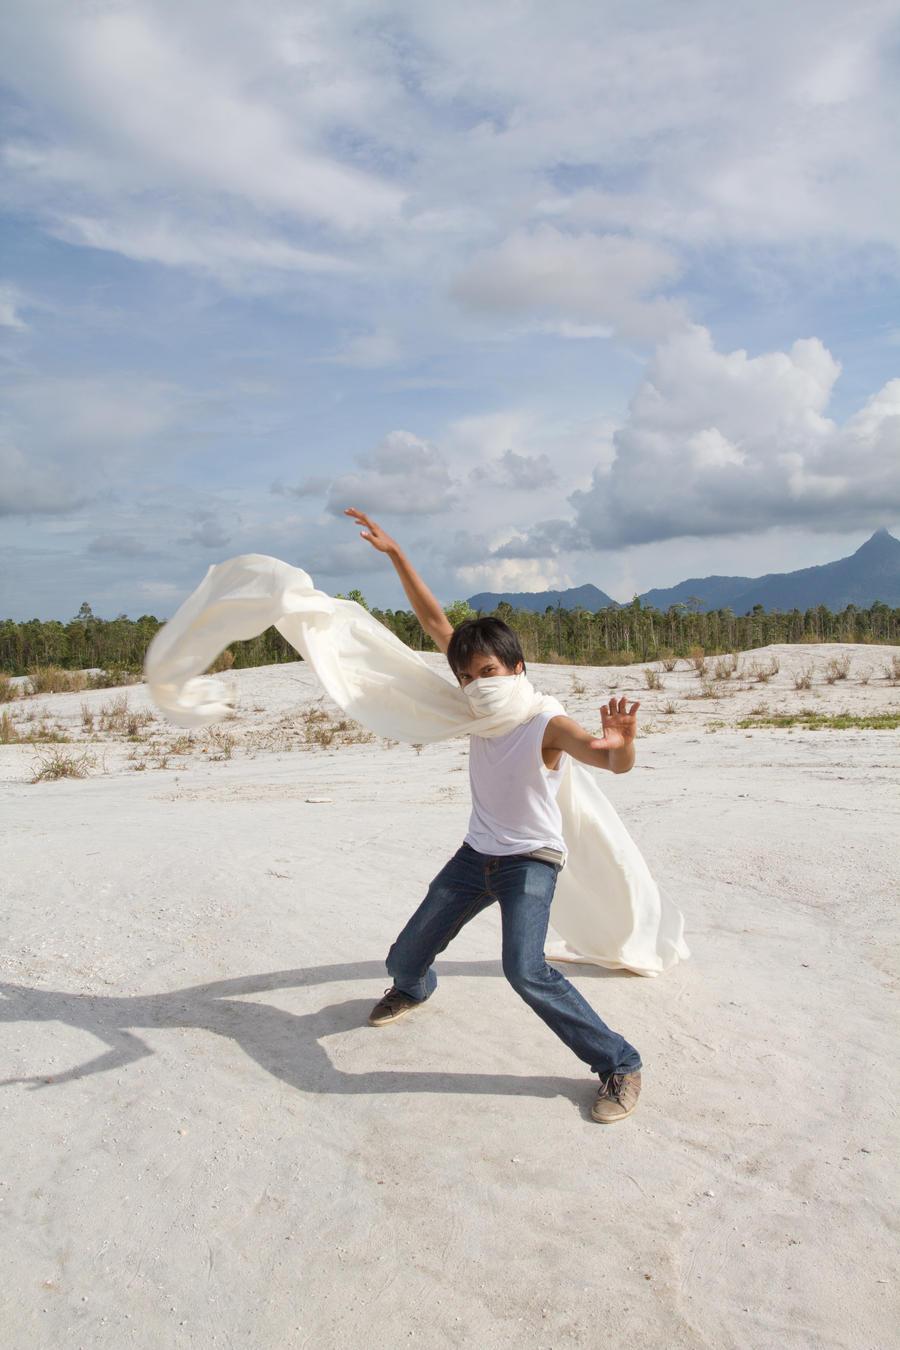 NInja sand by arya-poenya-stock